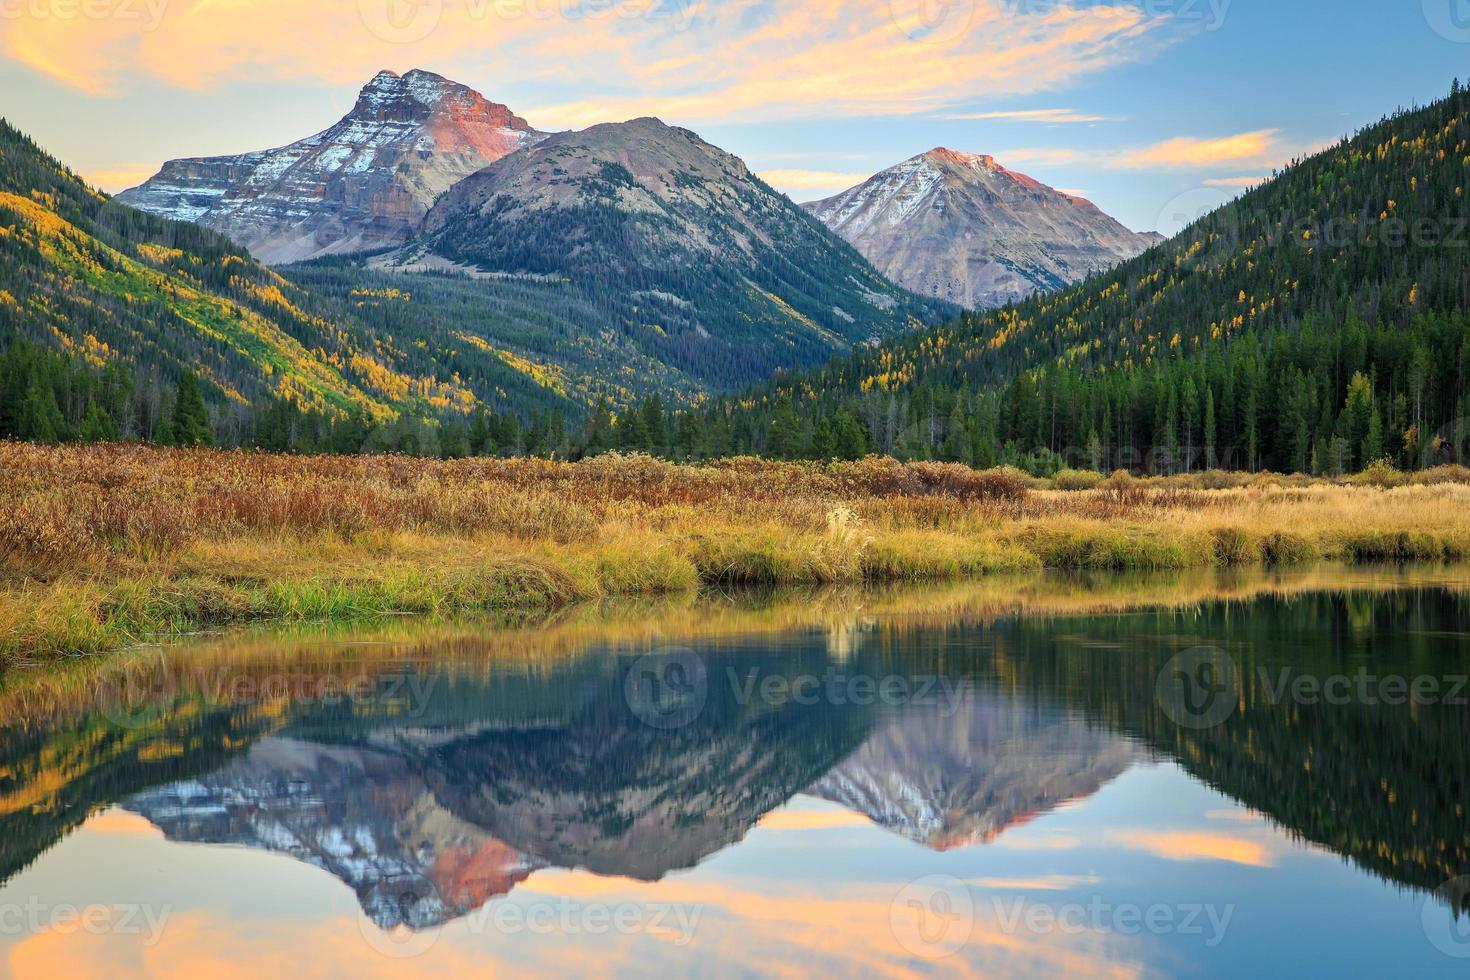 Sonnenuntergang auf Ostler Peak. foto